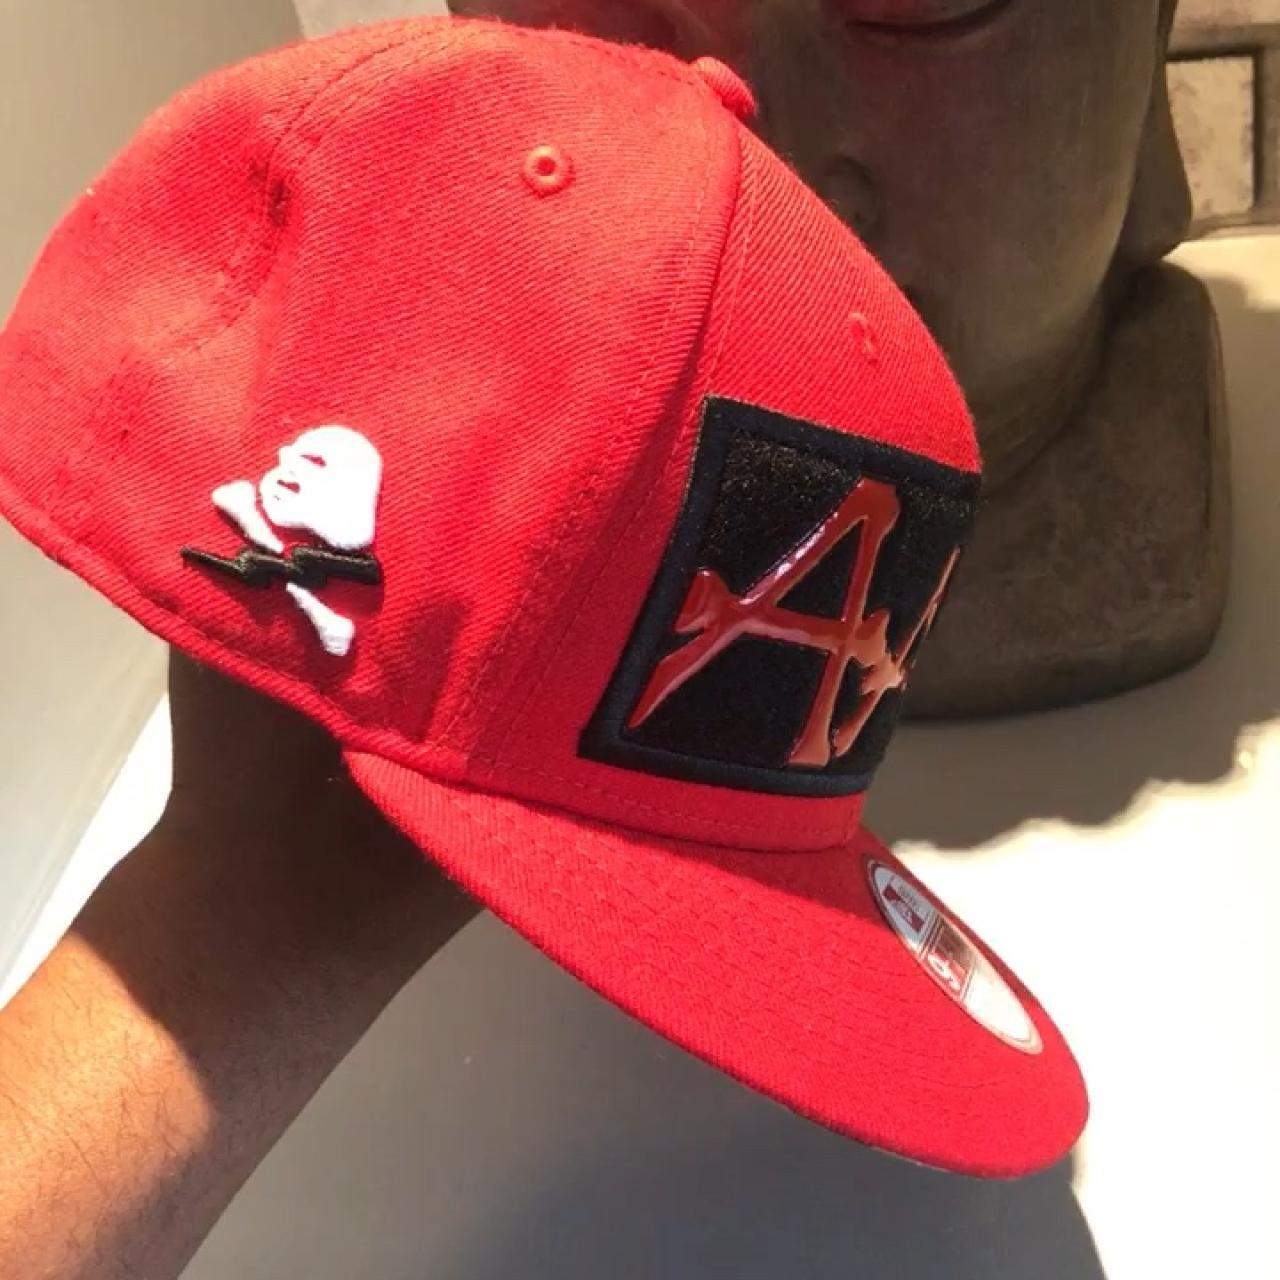 AAPE by BAPE new era 9fifty SnapBack Rare hat All stickers - Depop 2d37e4410578